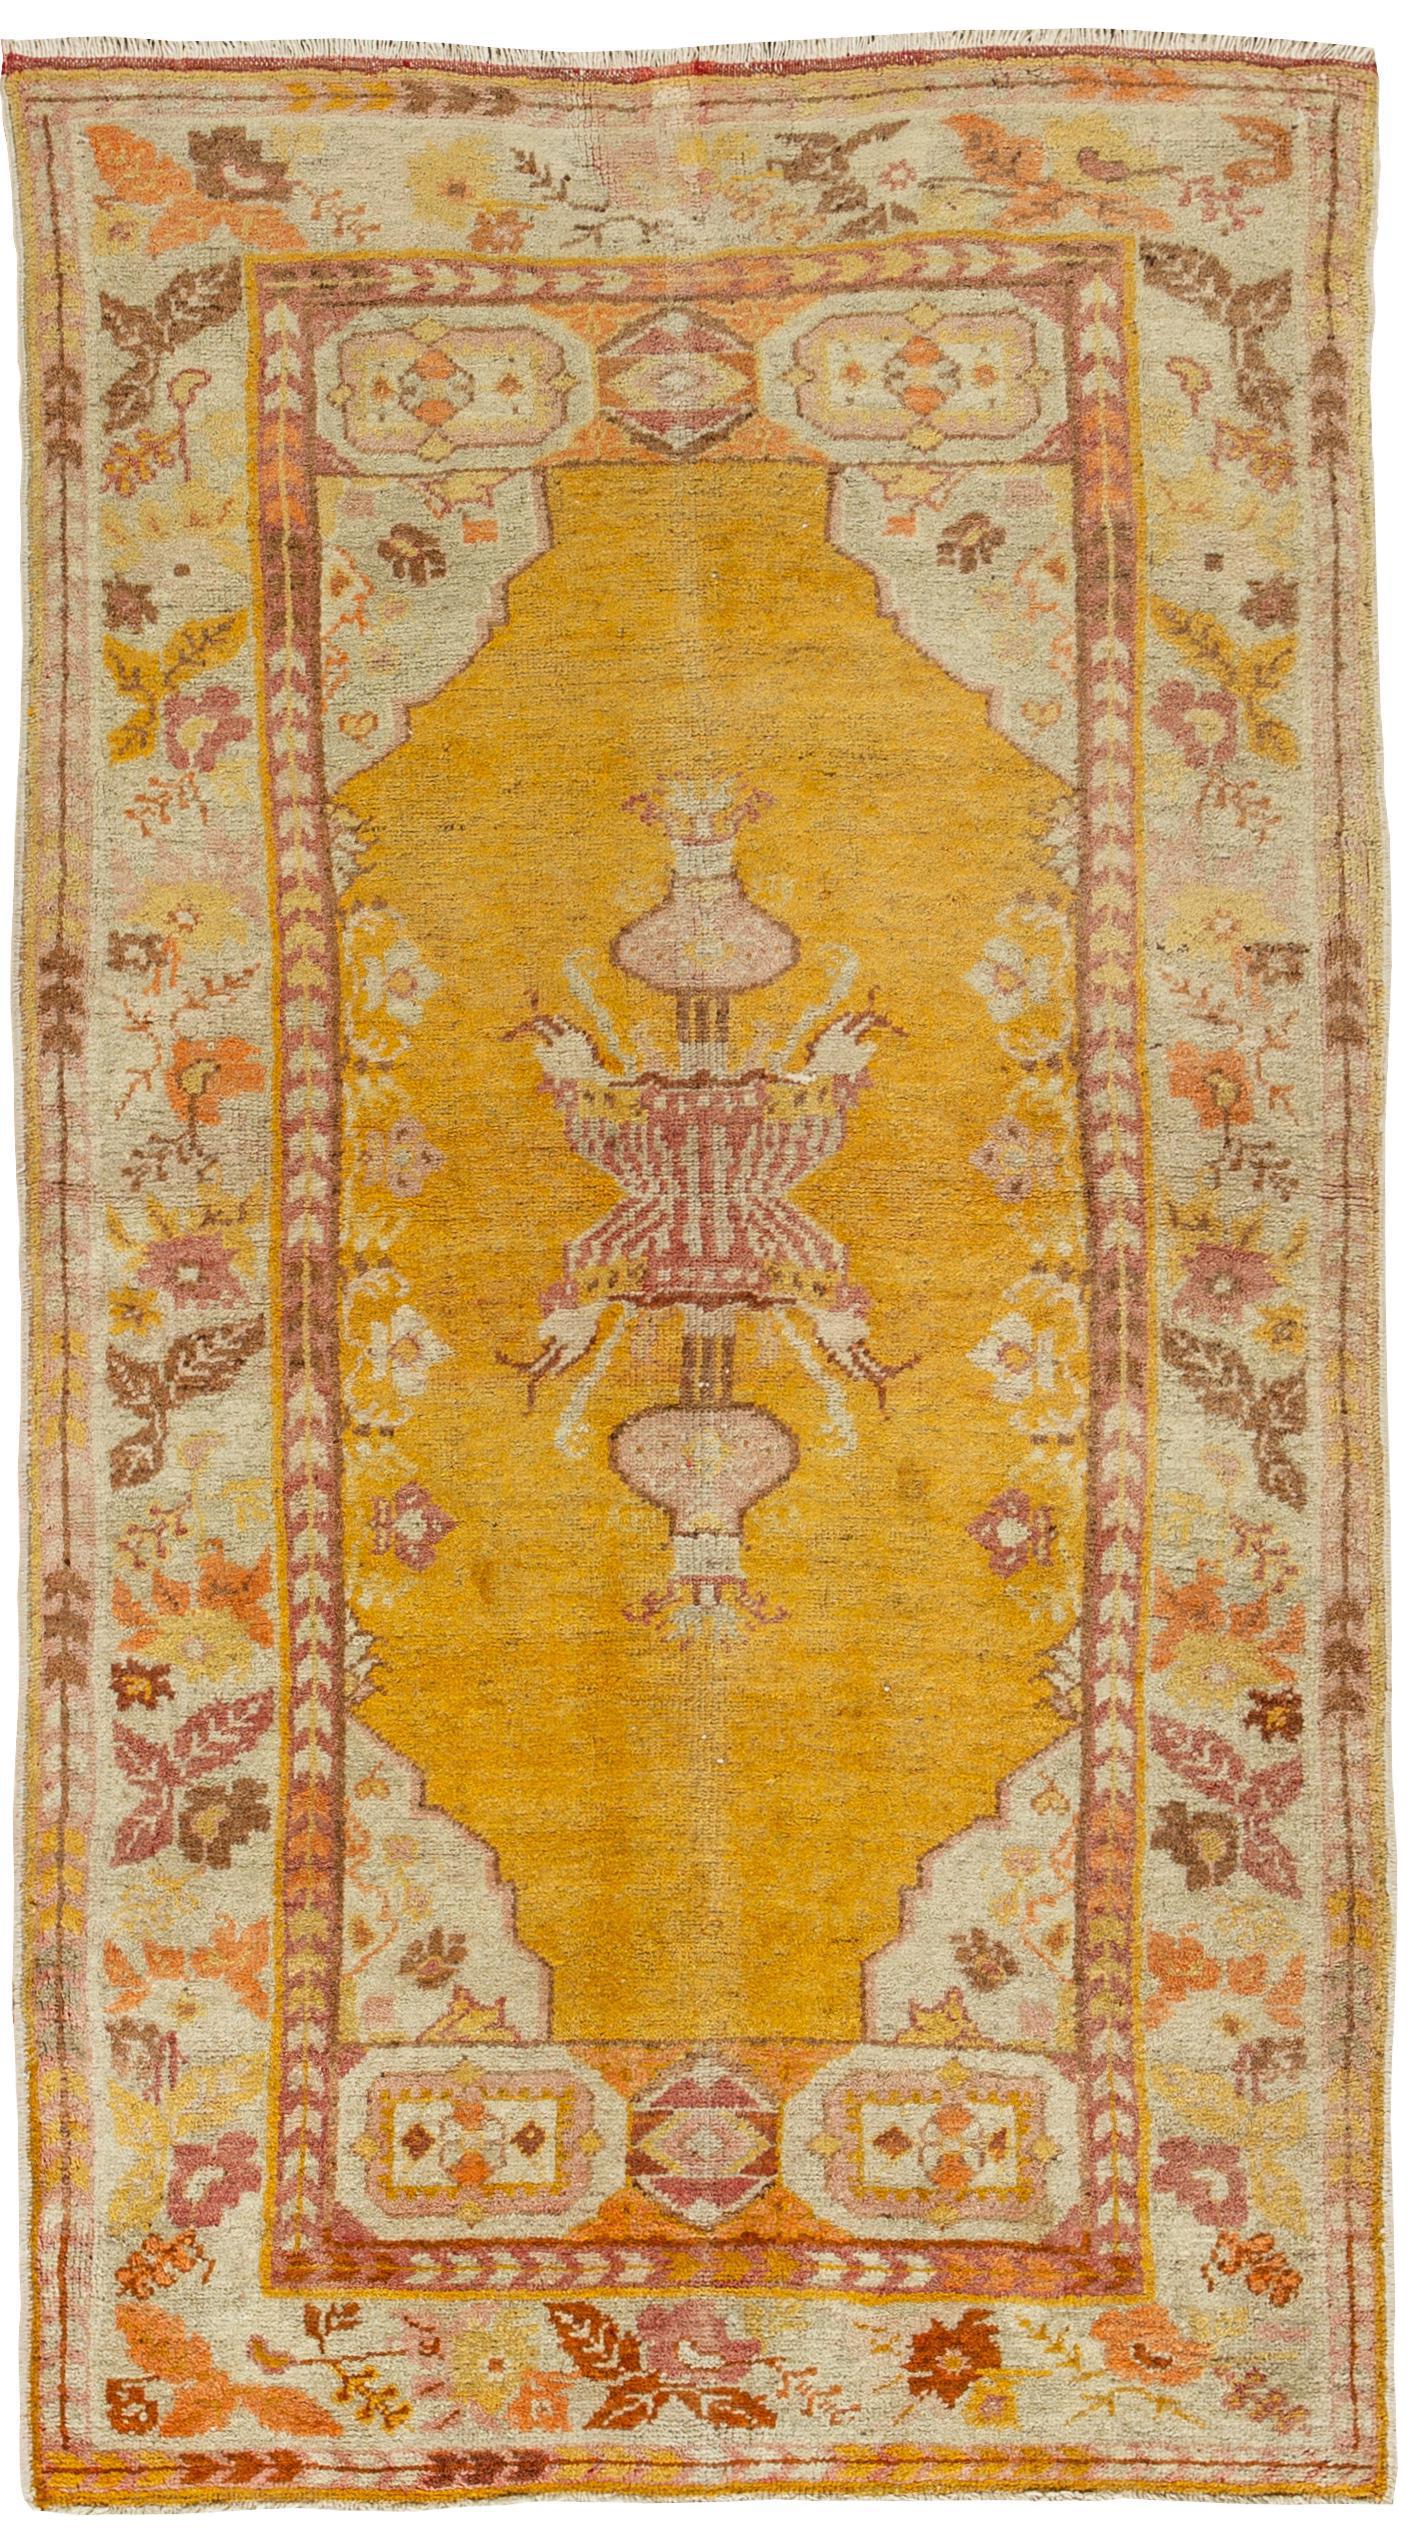 apadana-vintage-turkish-oushak-rug-3-x-58-2622